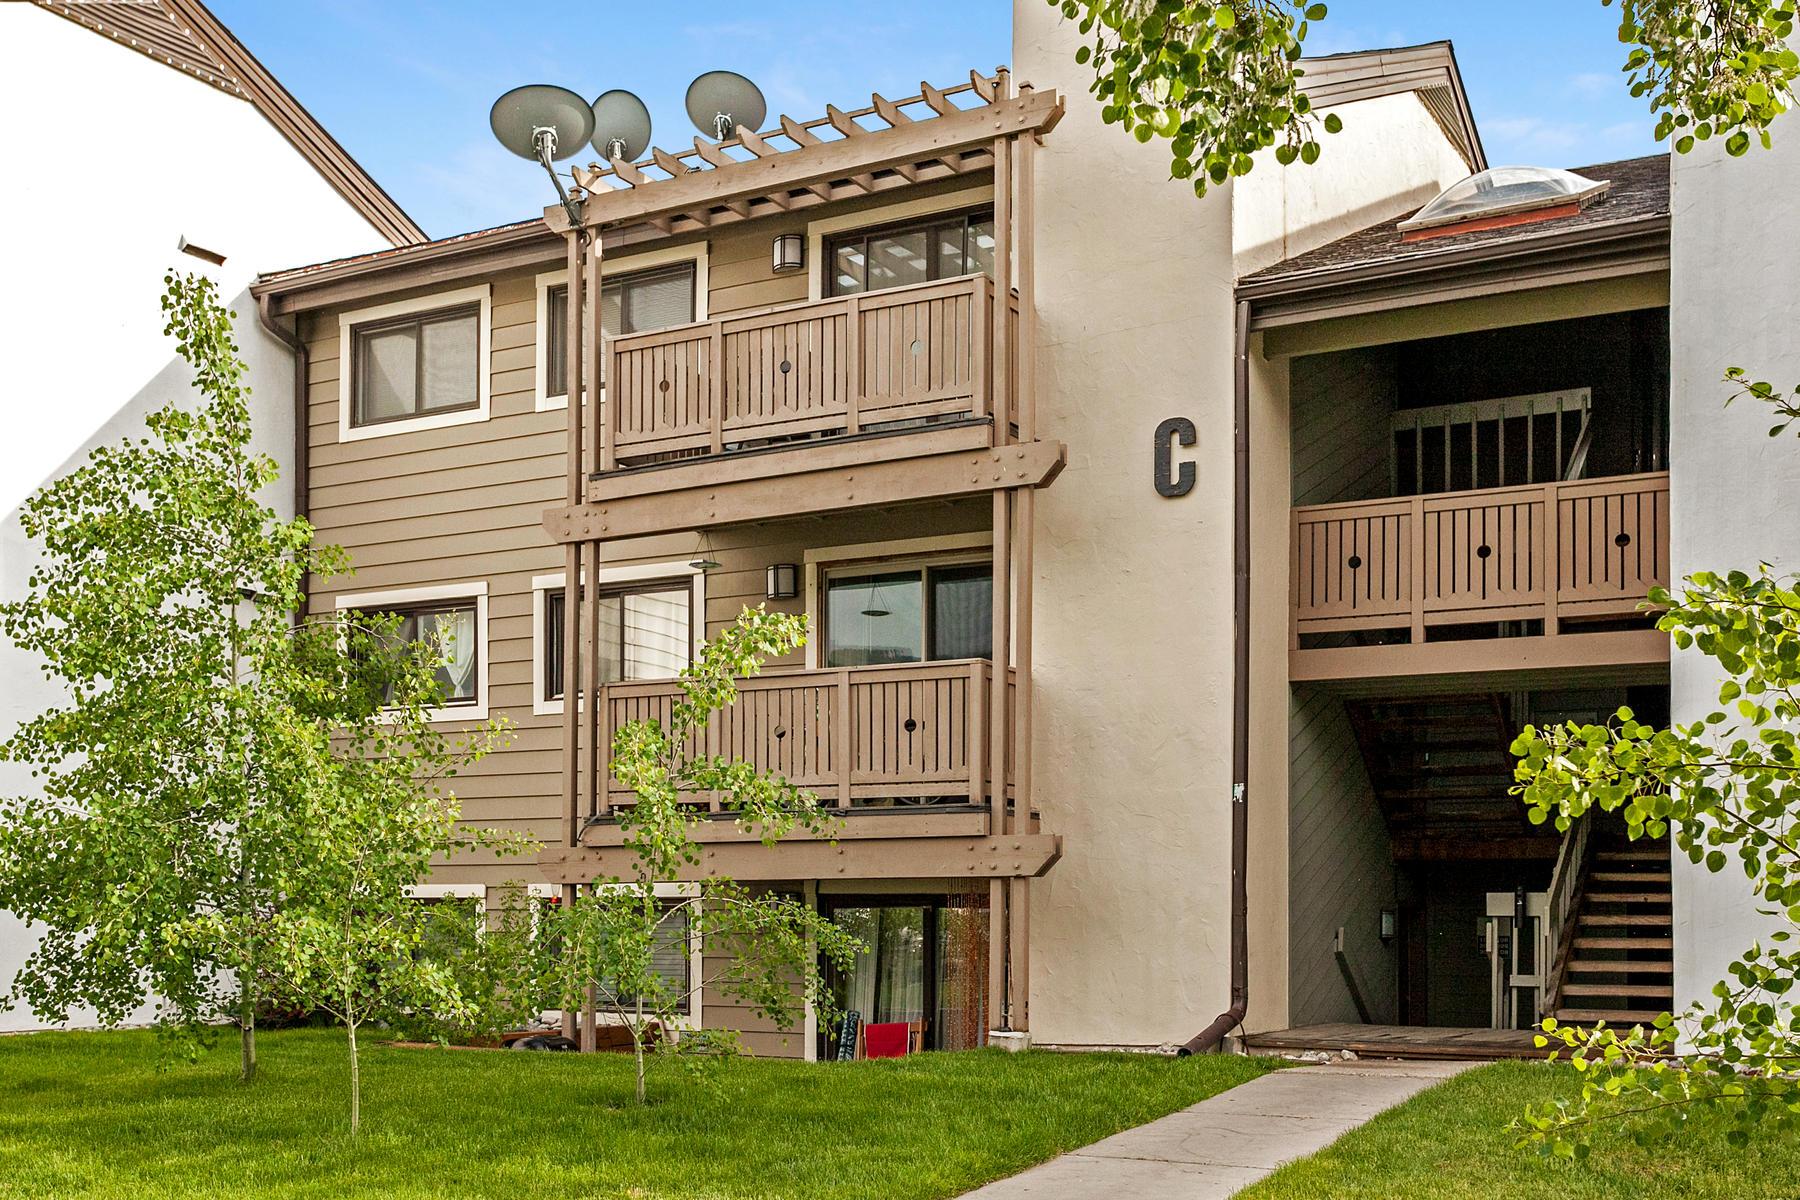 Condominium for Active at Walking distance to Beaver Creek 998 Beaver Creek Blvd #C205 Avon, Colorado 81620 United States